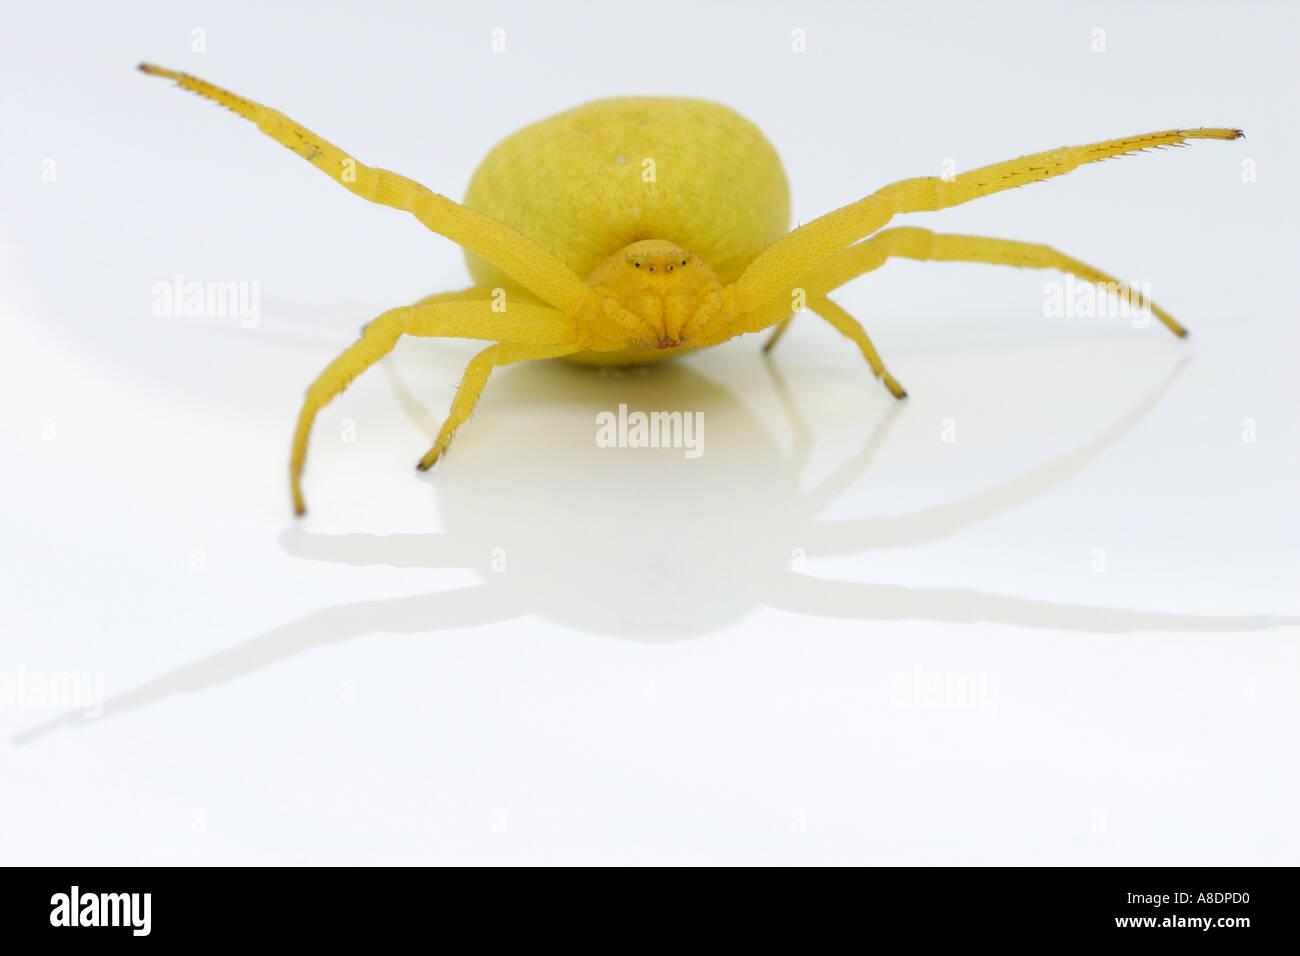 Yellow crab spider, Misumena vatia Stock Photo